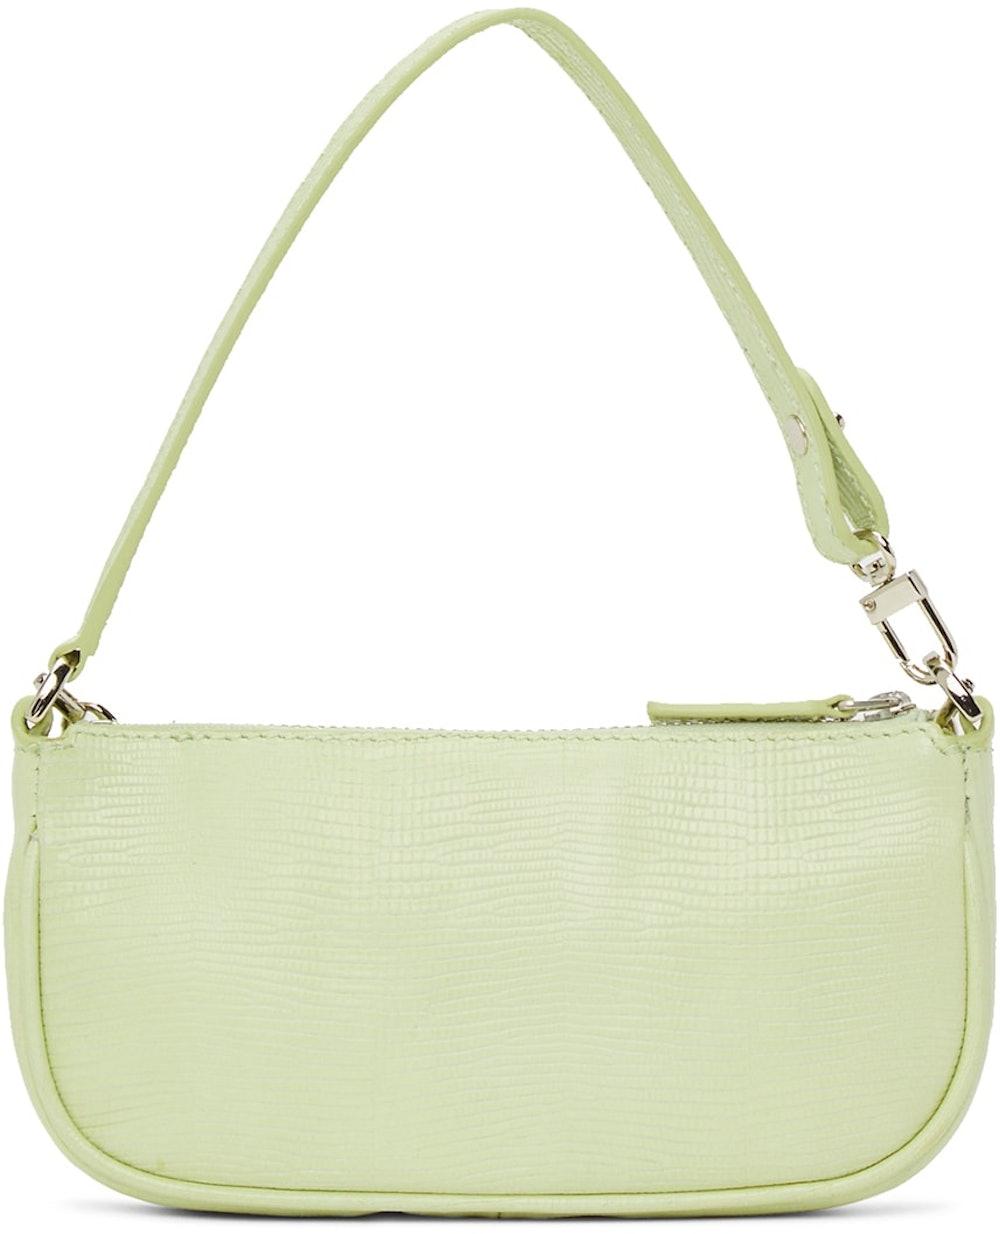 SSENSE Exclusive Green Lizard Mini Rachel Bag